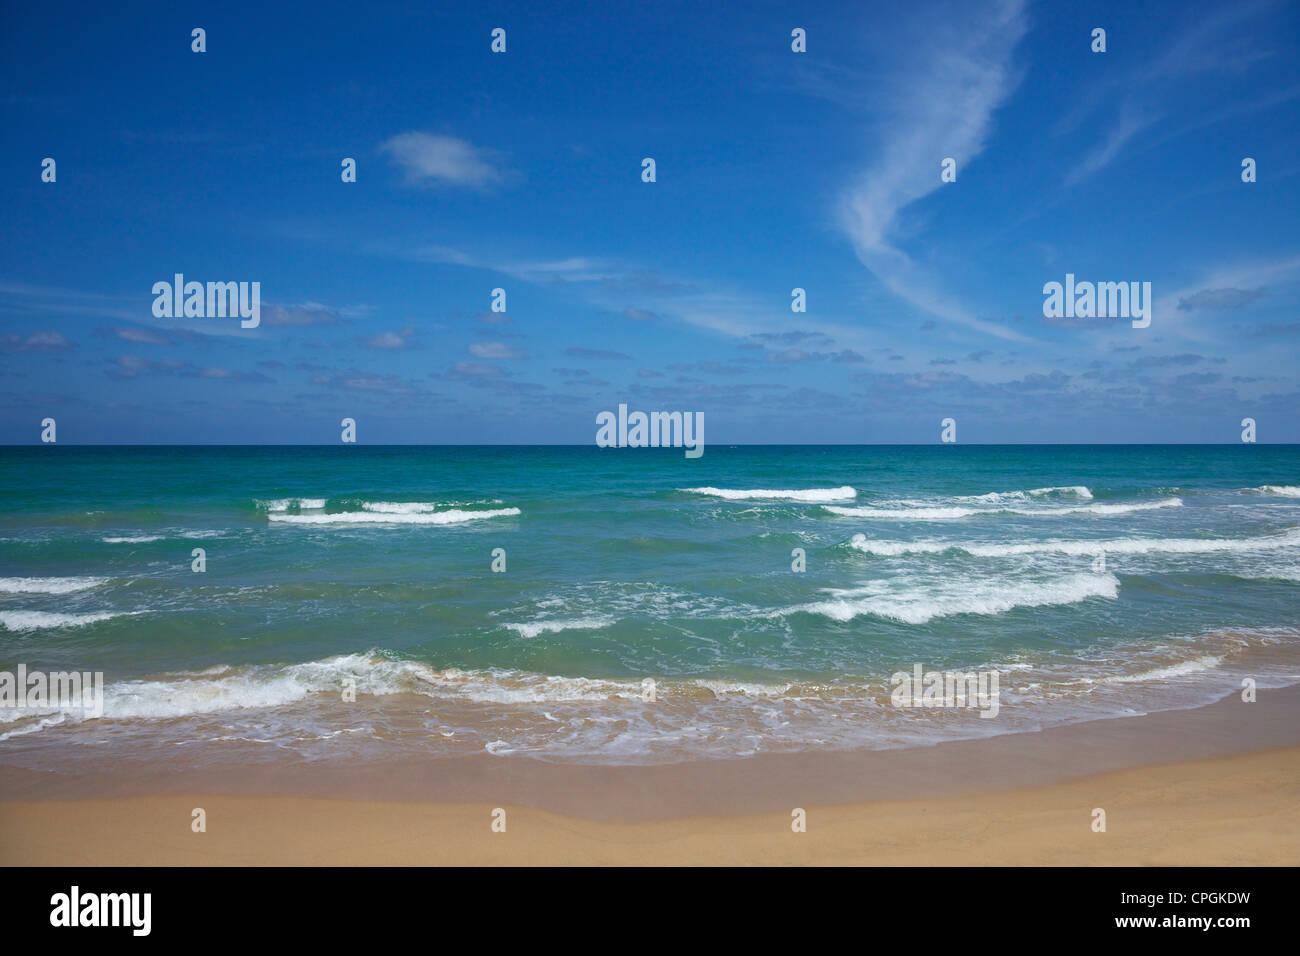 Nilaveli beach and the Indian Ocean, Trincomalee, Sri Lanka, Asia - Stock Image